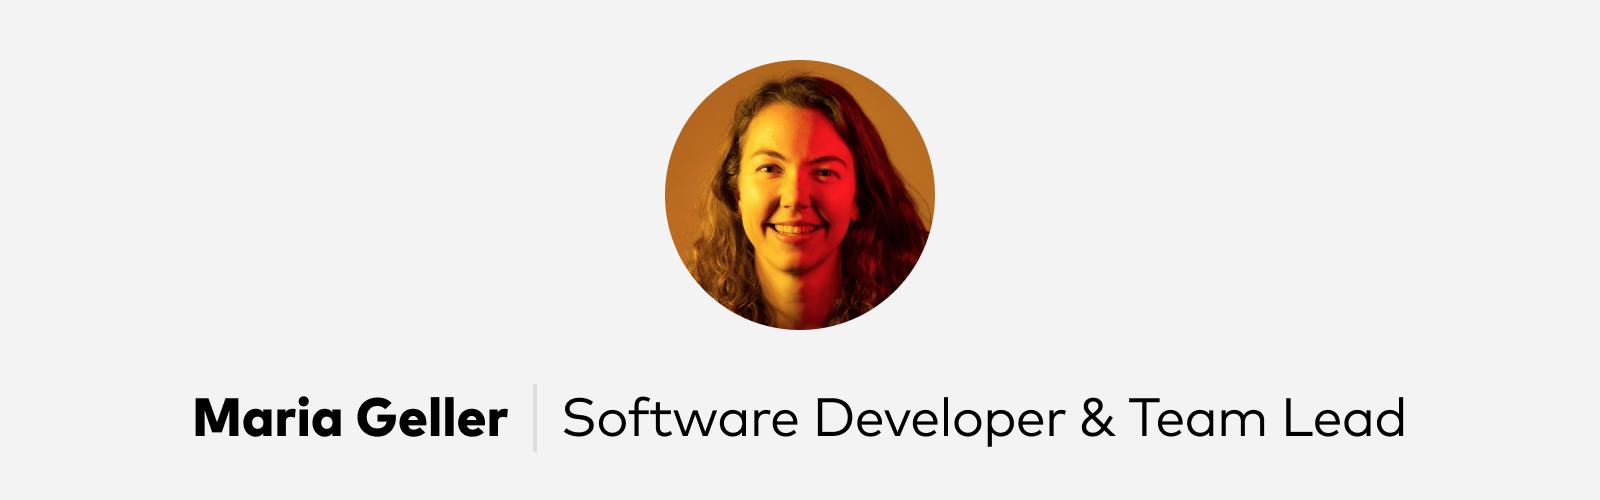 Maria Geller Software Developer at Pitch